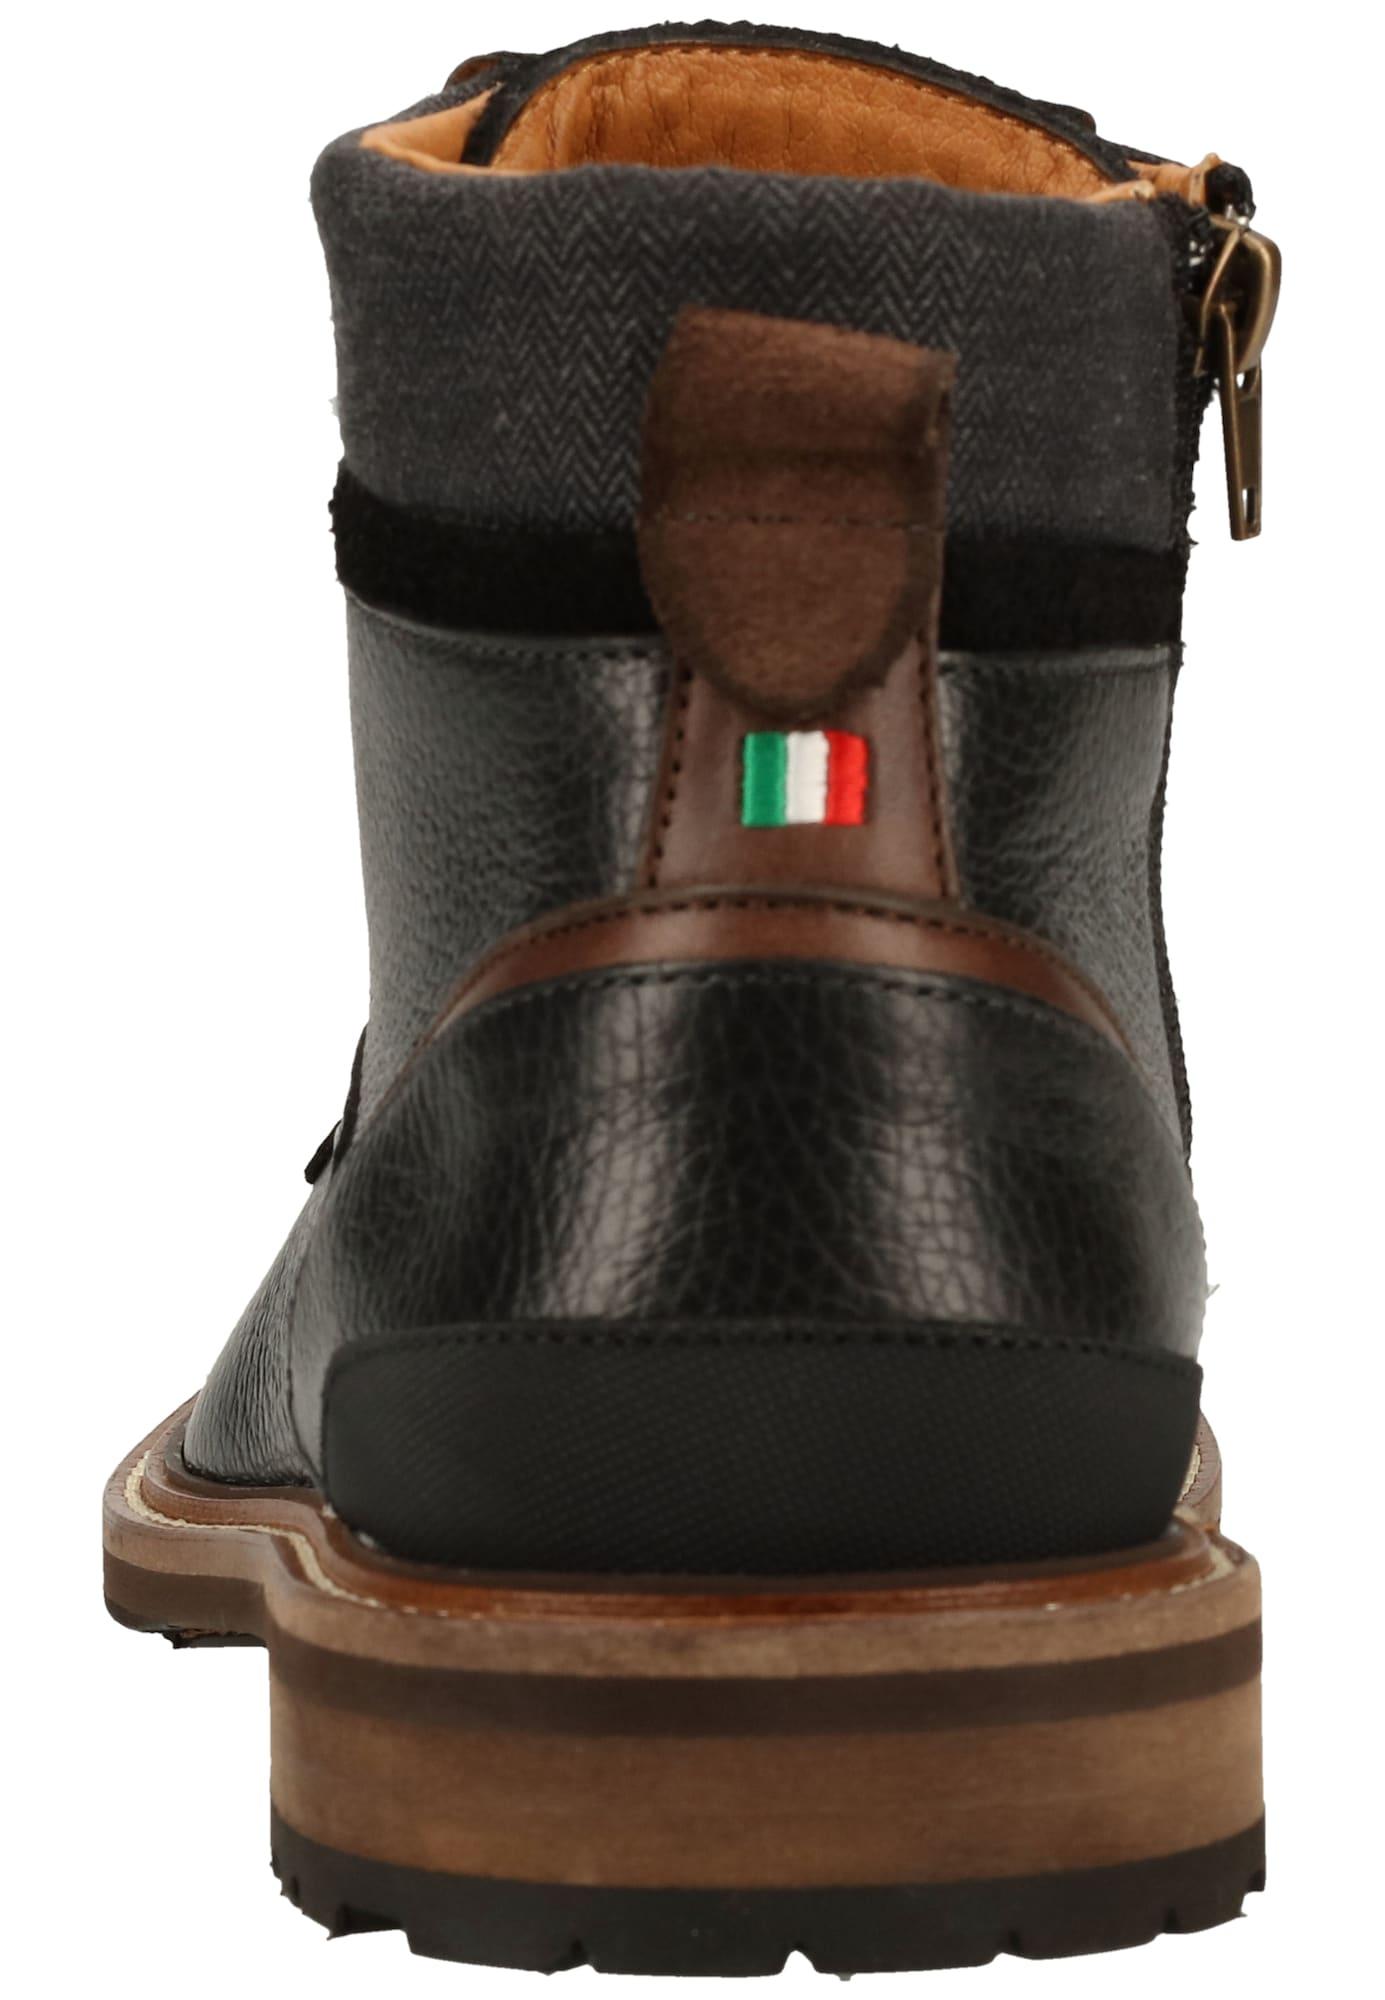 pantofola d'oro - Stiefel